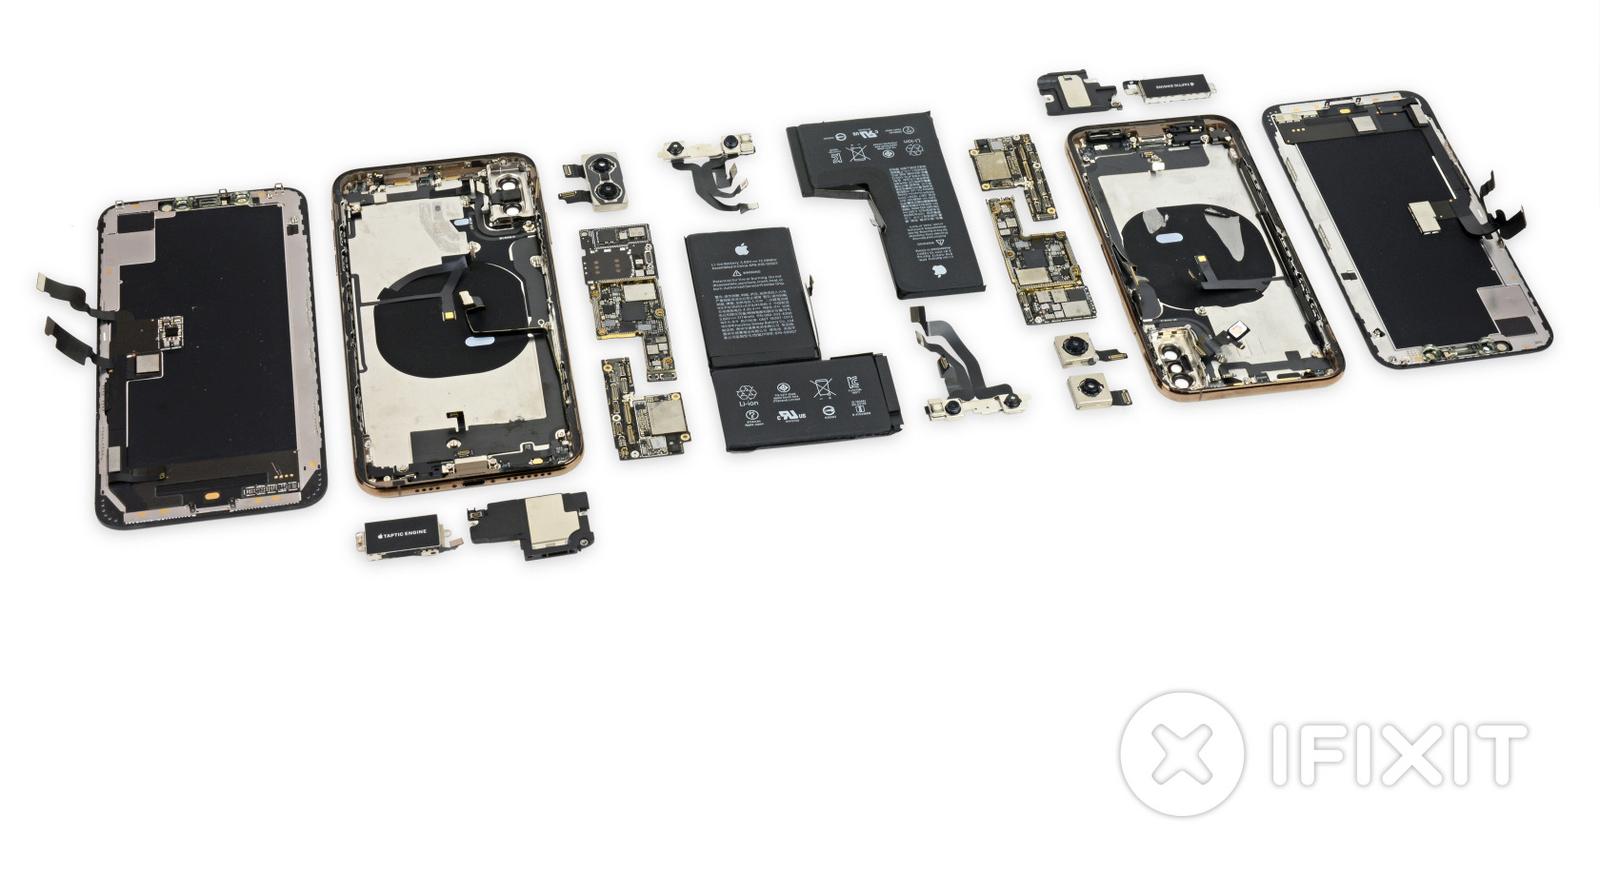 I nuovi iPhone XS e iPhone XS Max già smontati